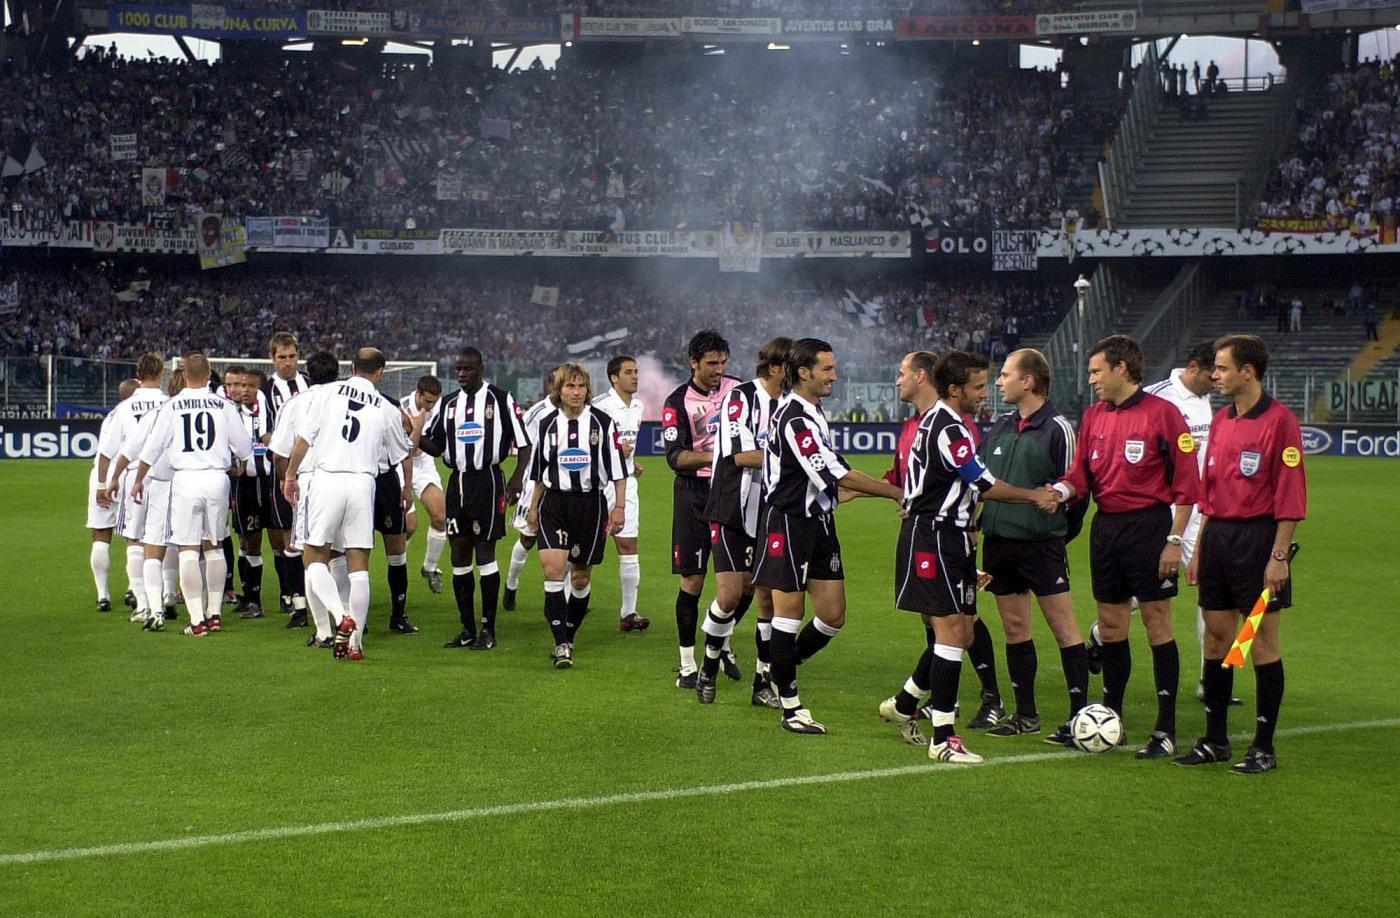 Juve Real 2002 2003